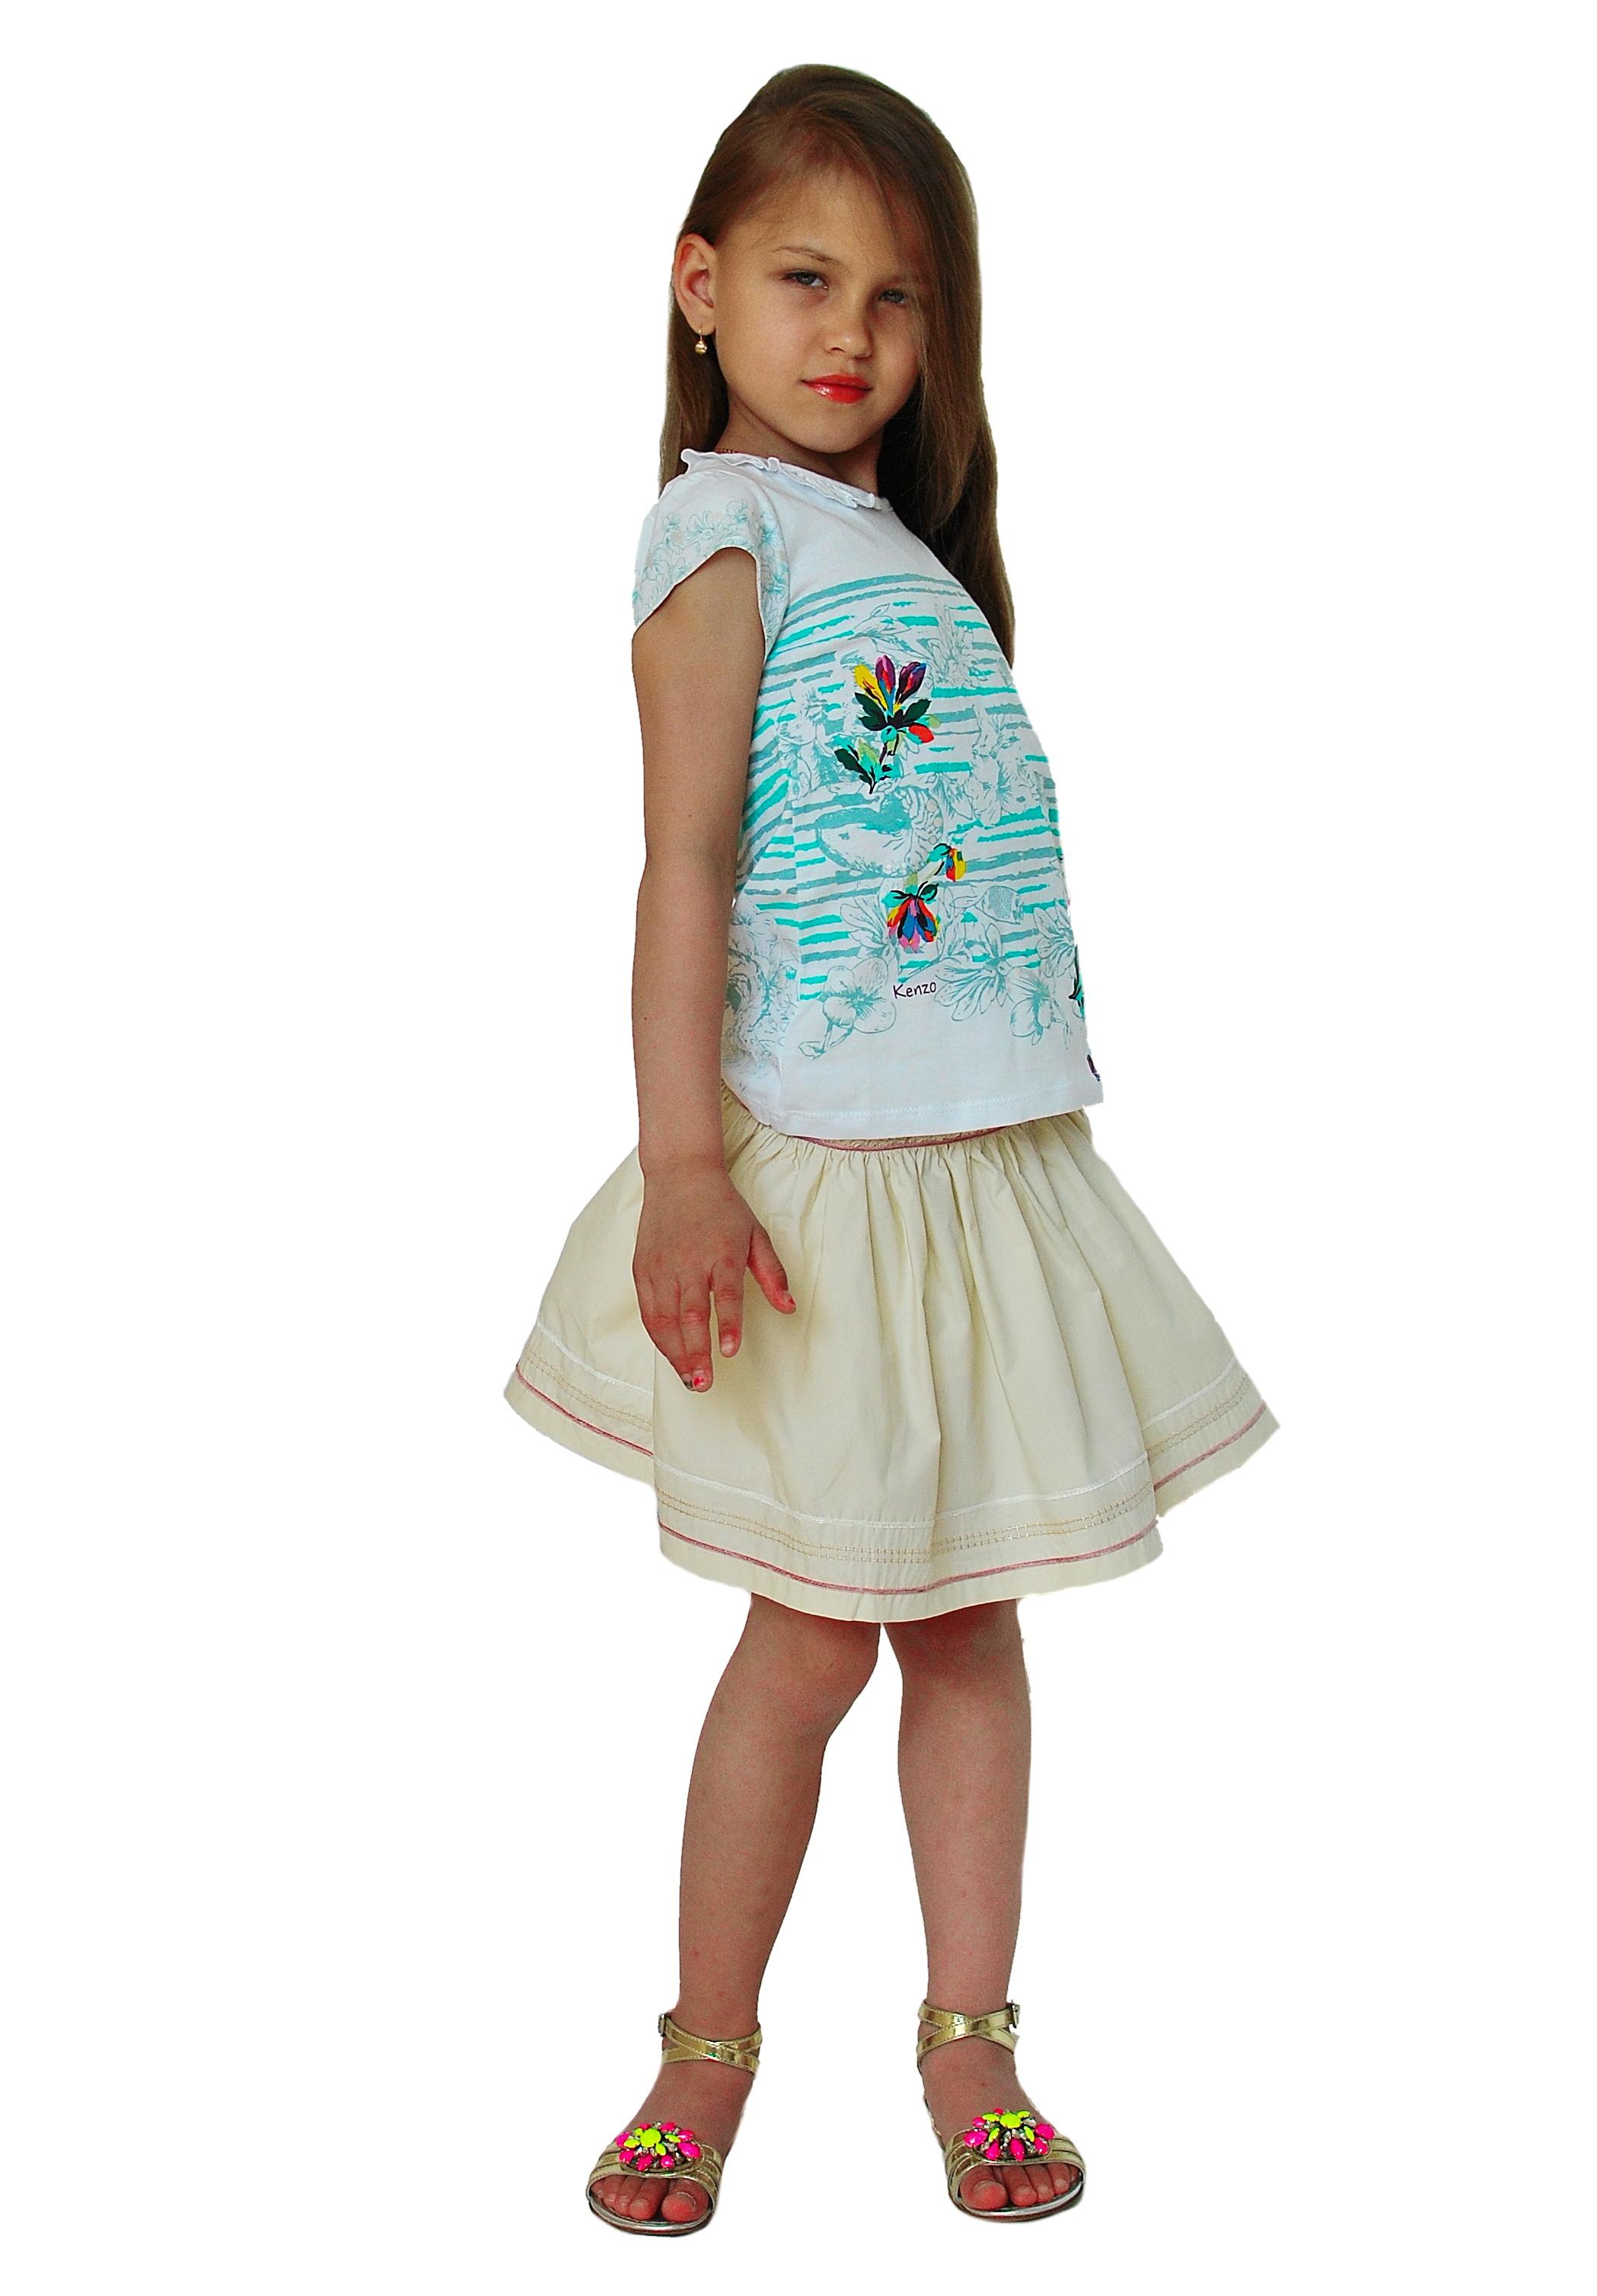 Фото 6: Яркая футболка Kenzo для девочек